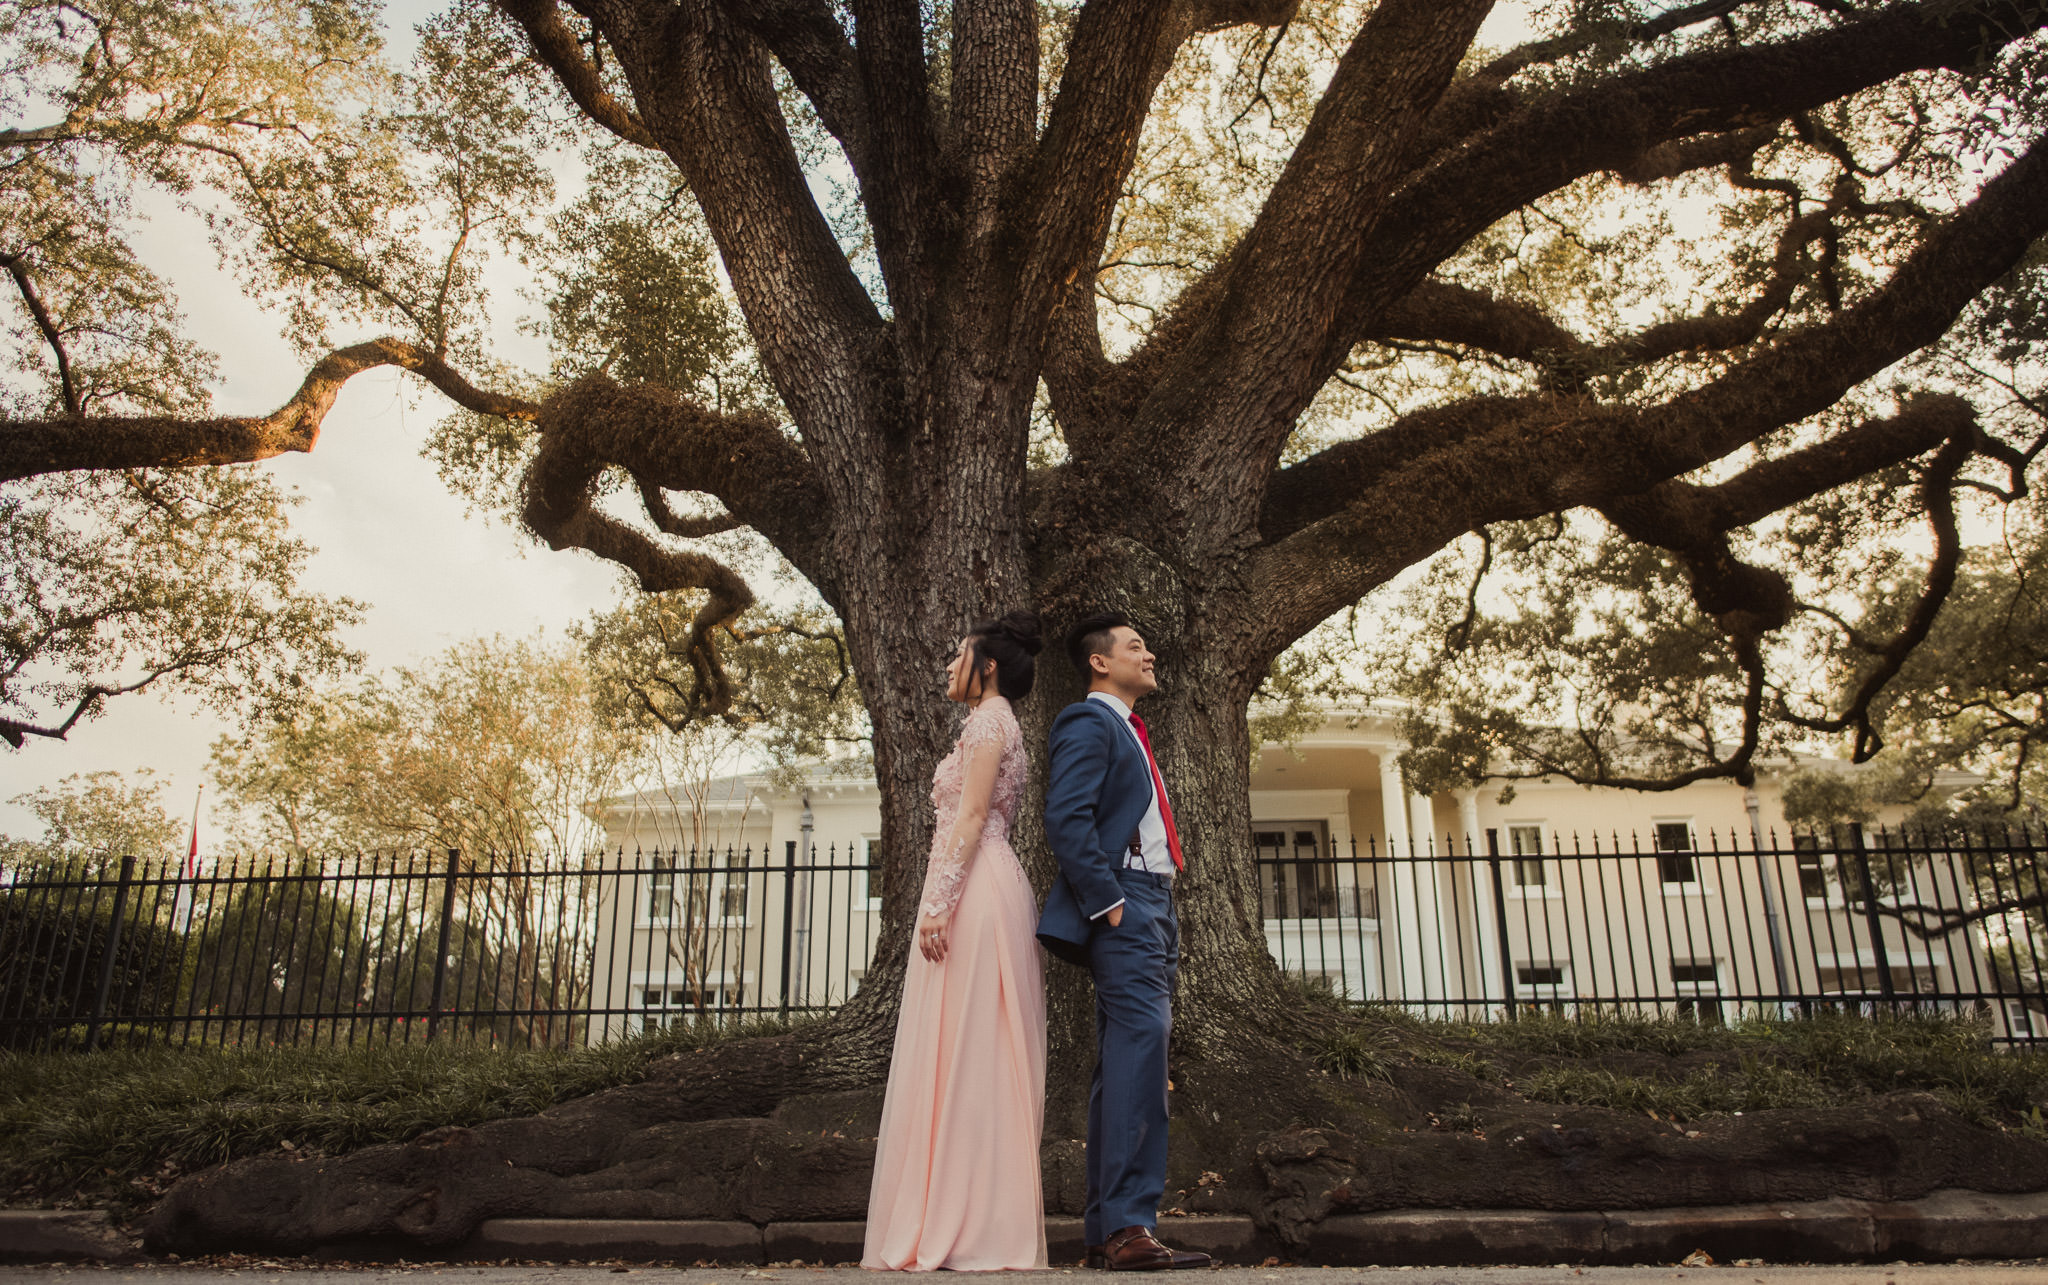 kim-michael-houston-vietnamese-tea-ceremony-engagement-downtown-boulevard-oaks-photographer-63.jpg